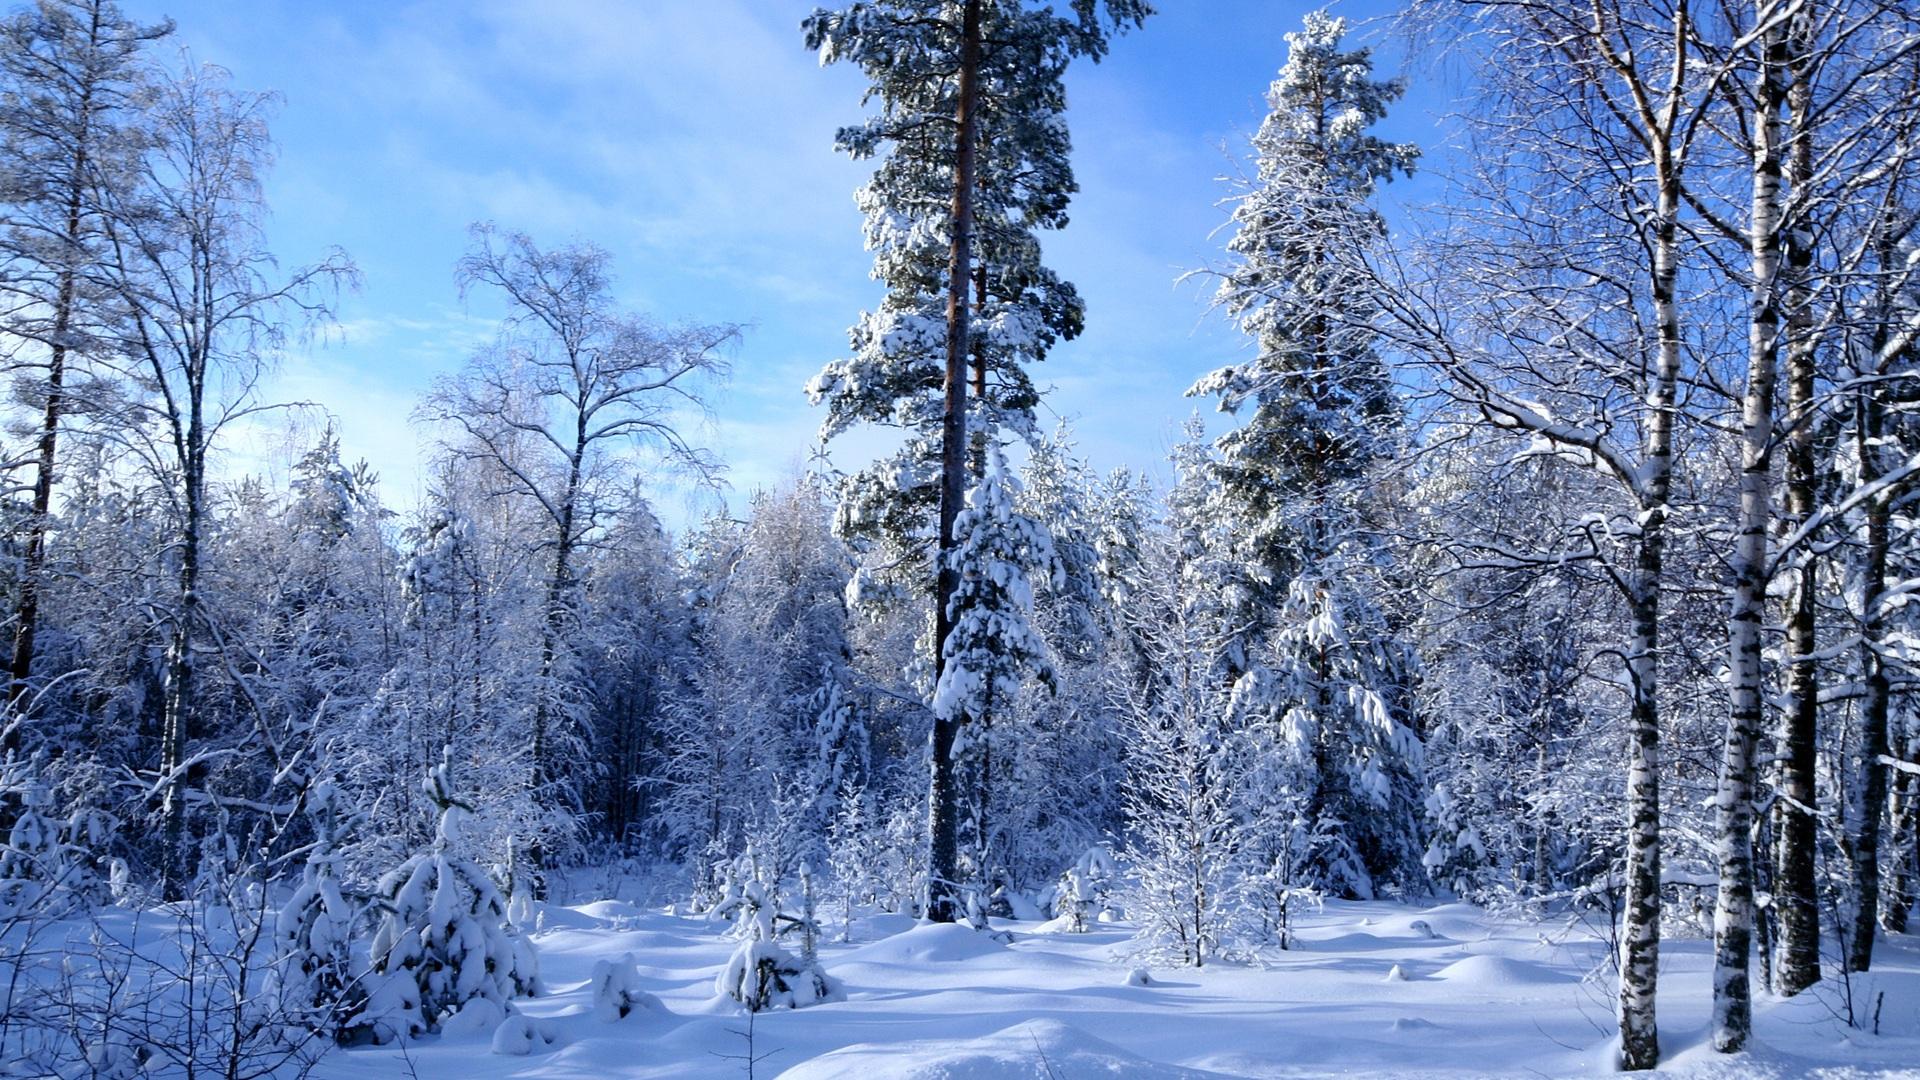 Winter forest snow much Wallpaper Desktop Wallpapers Wallpapers 1920x1080